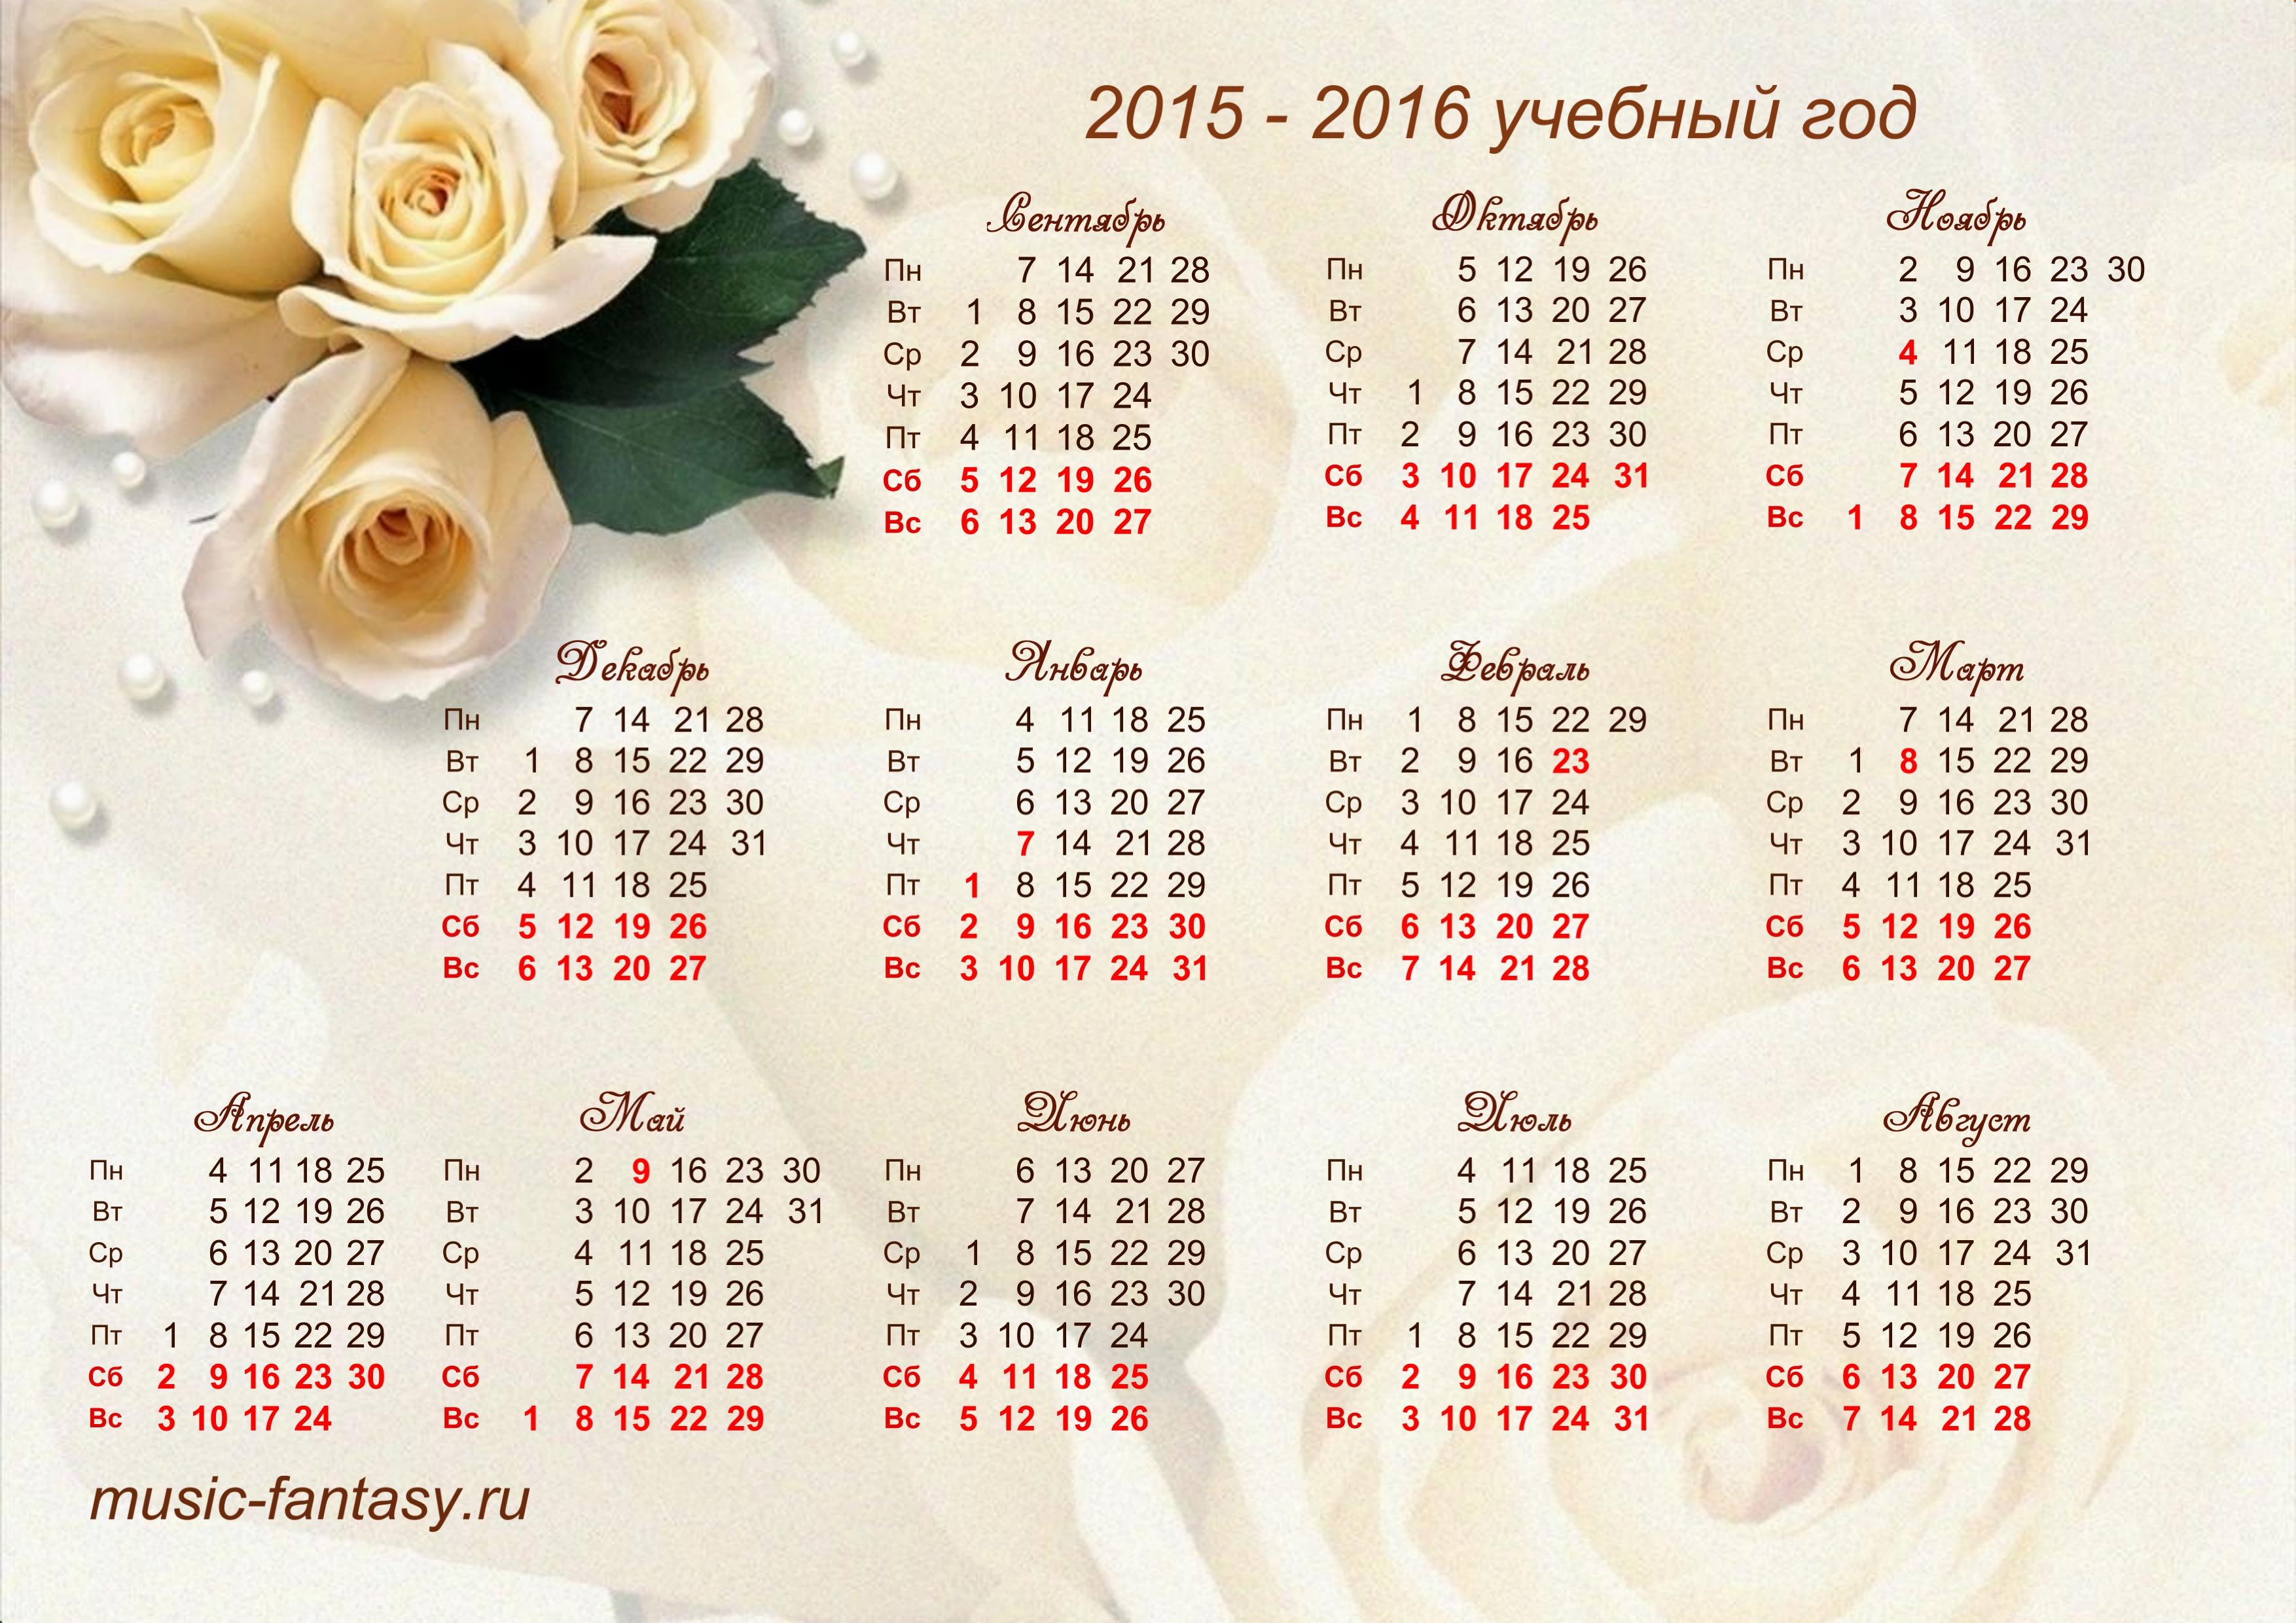 Шаблоны календарей 2015 года для фотошопа